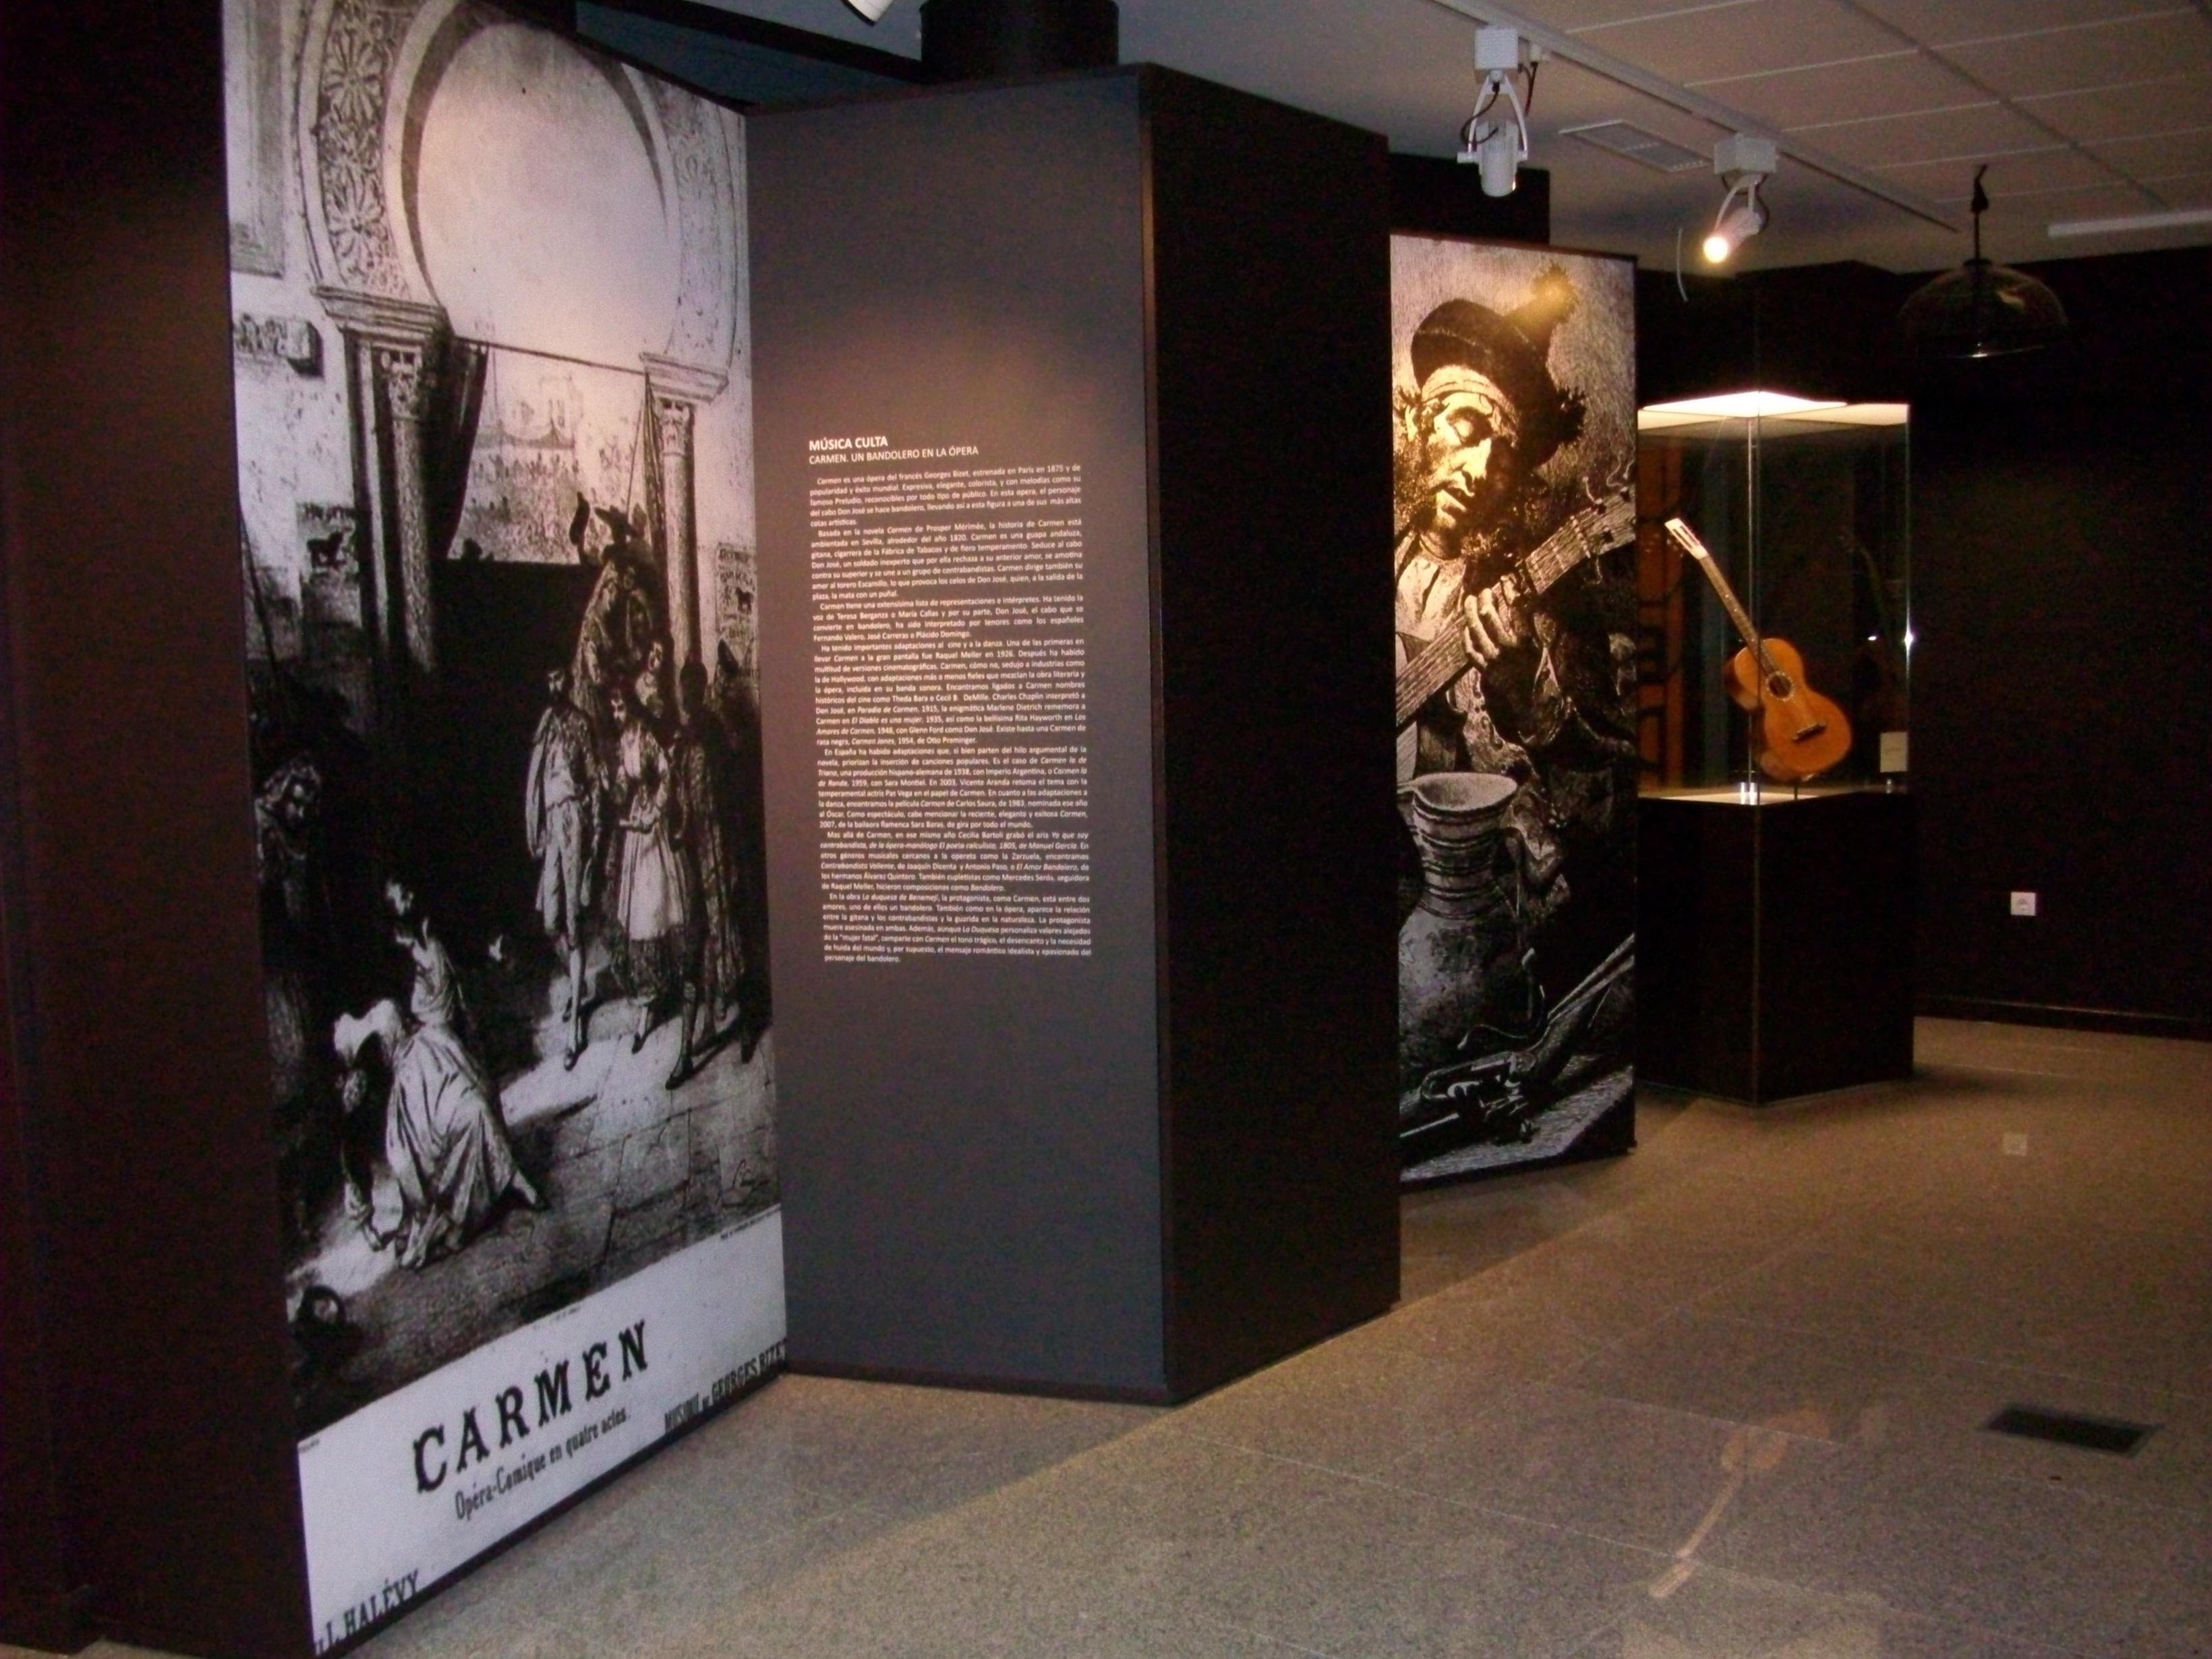 Centro-Museo La Duquesa de Benamejí